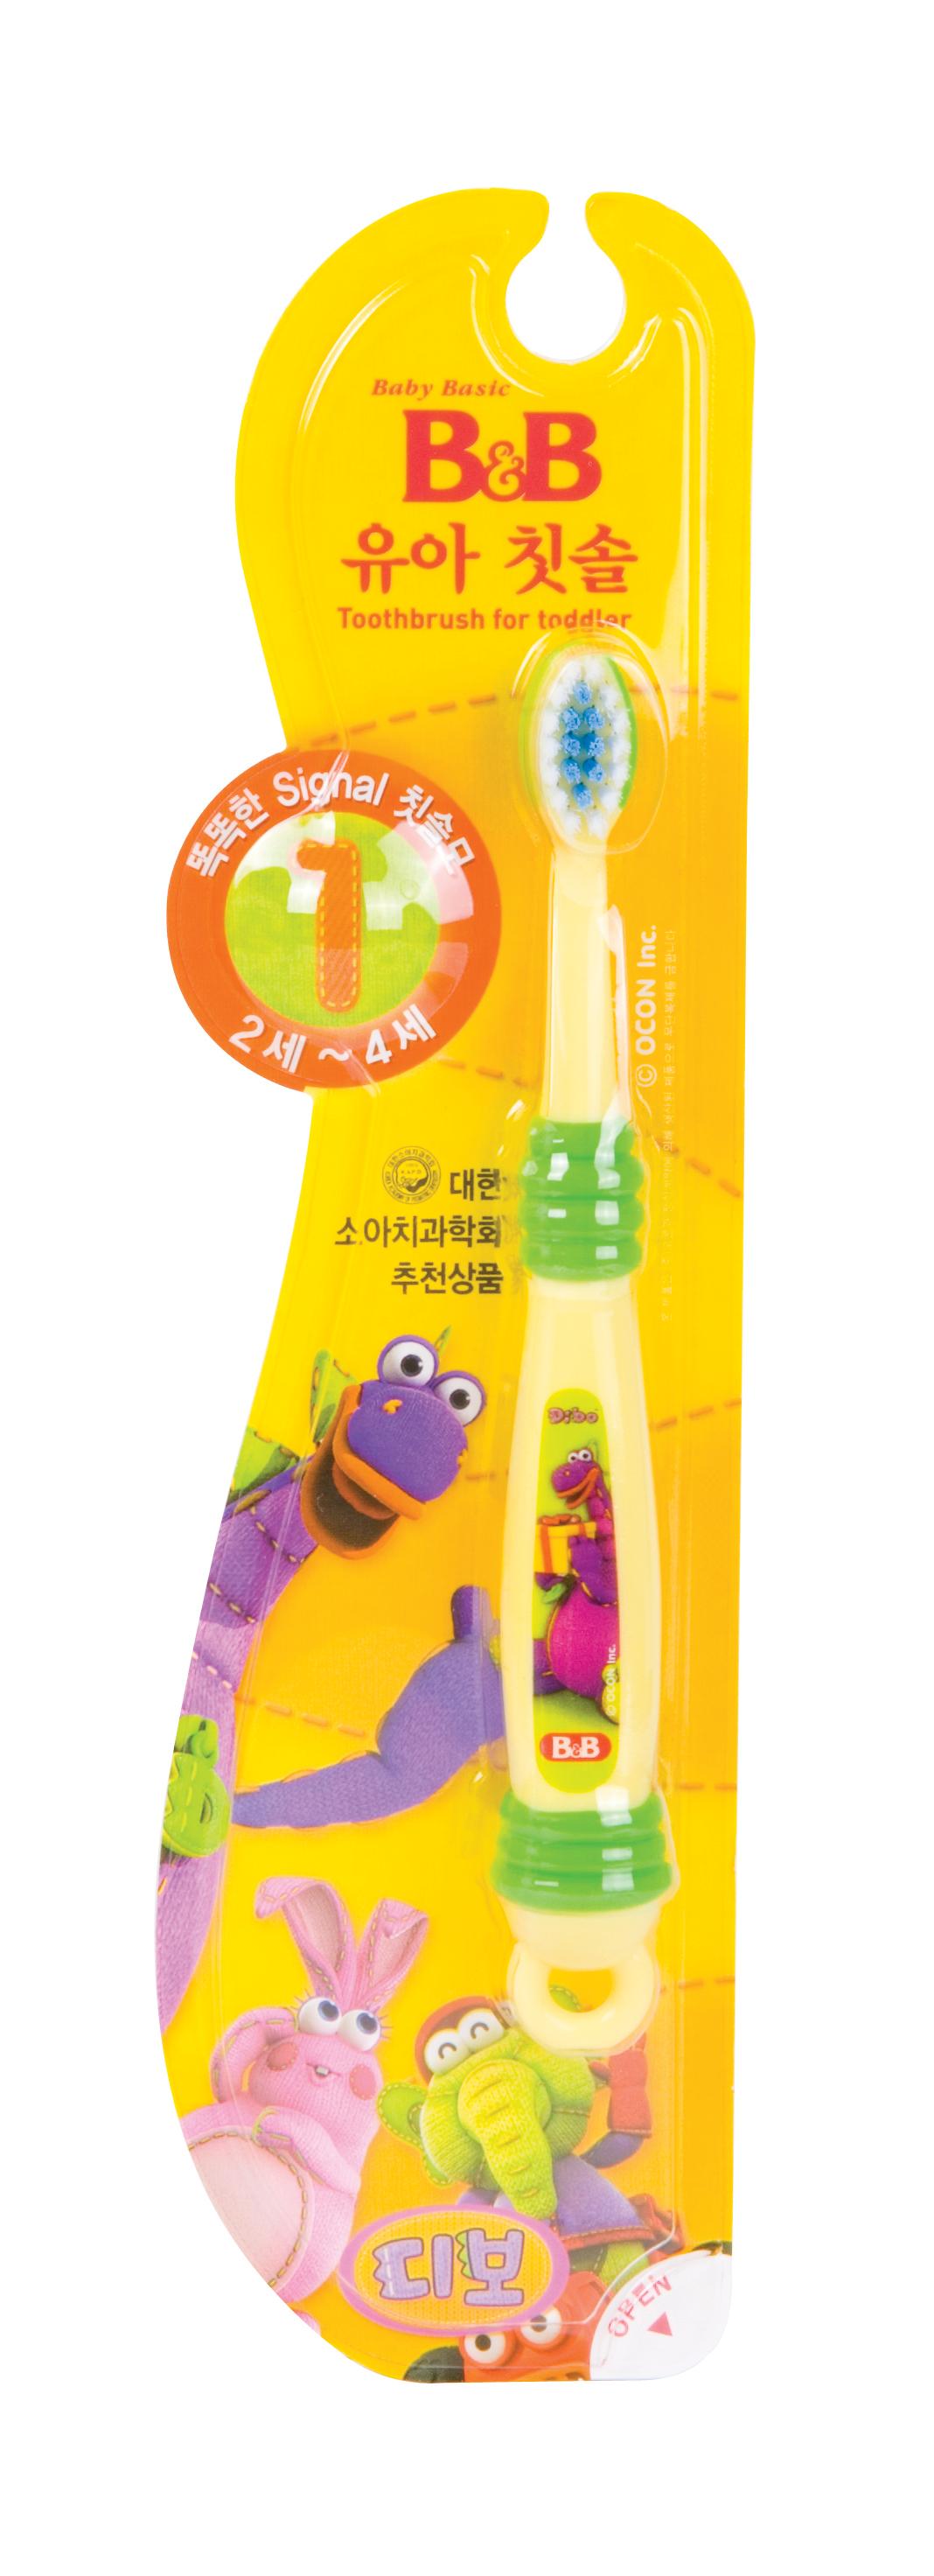 B&B Toothbrush